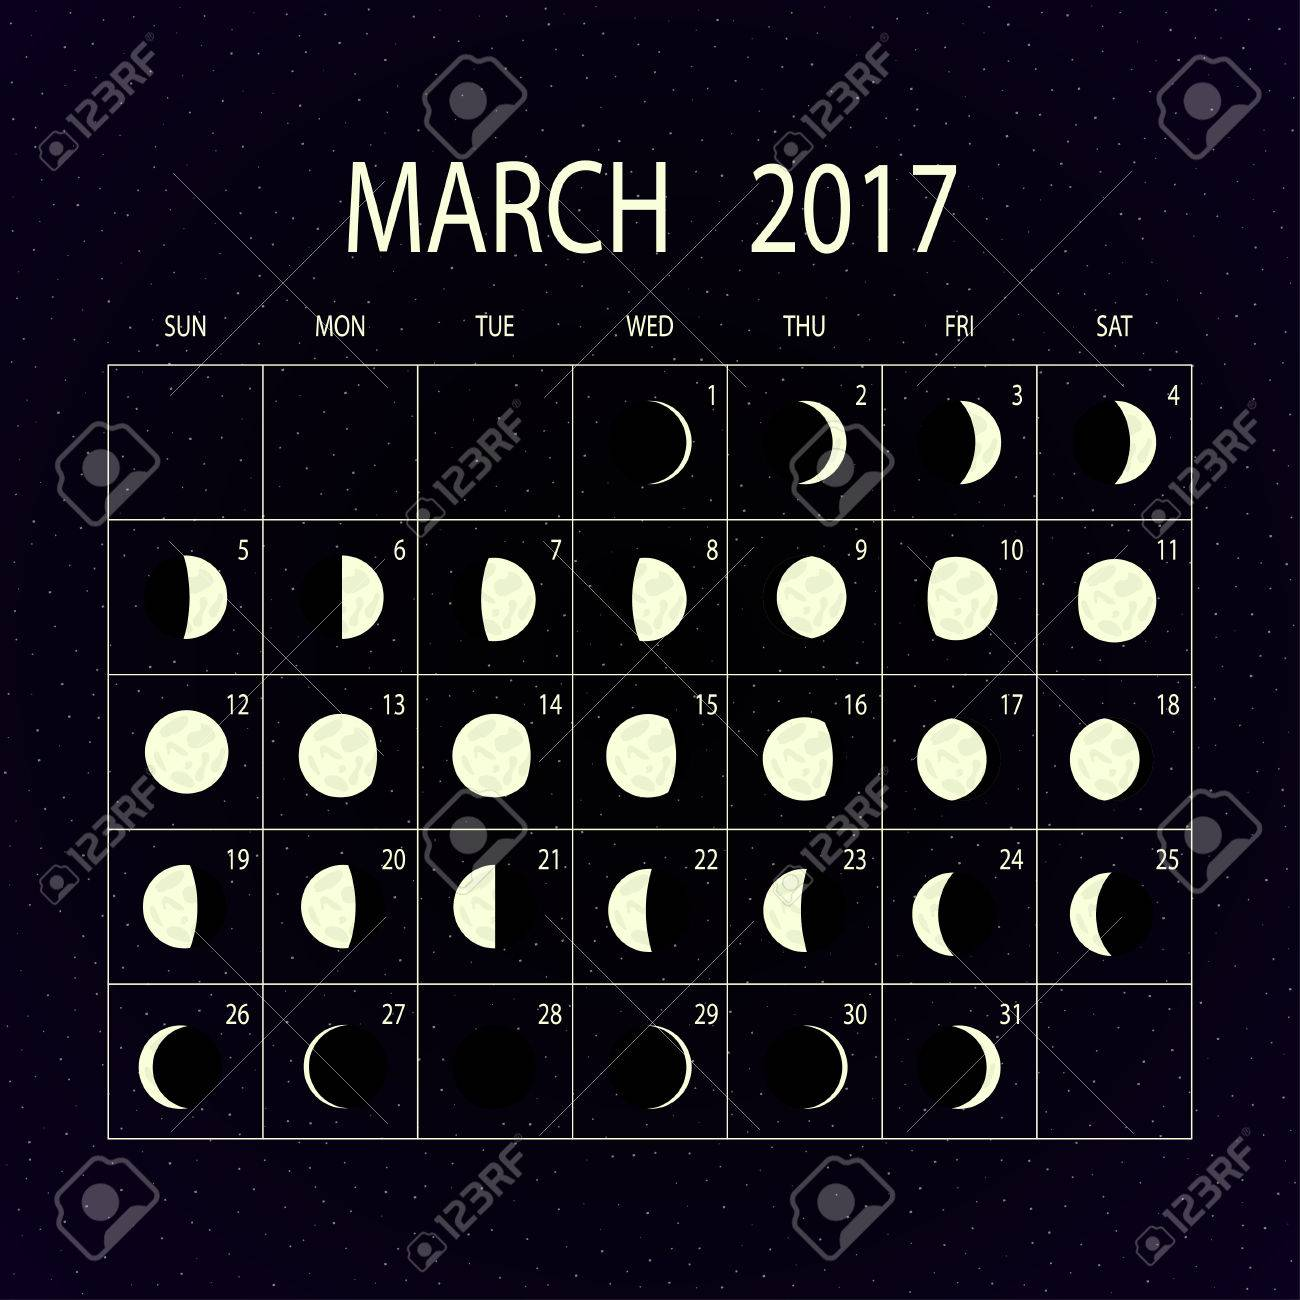 Lunar calendar for March 2017 56